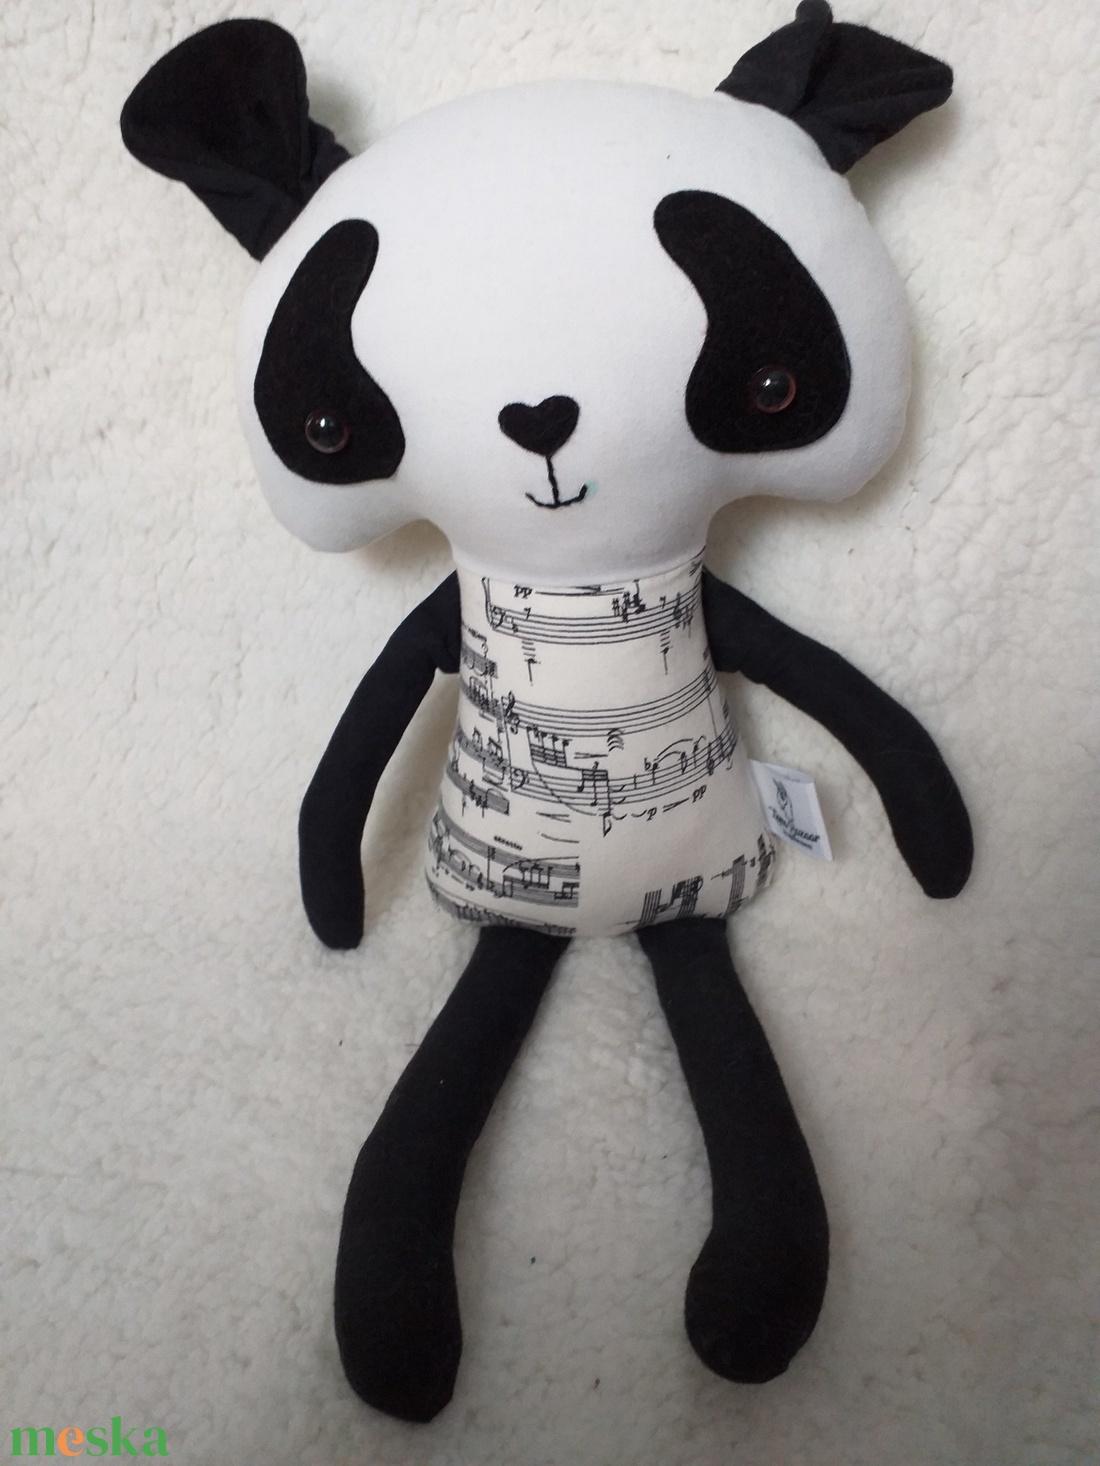 Panda figura hangjegyes ruhában - Meska.hu